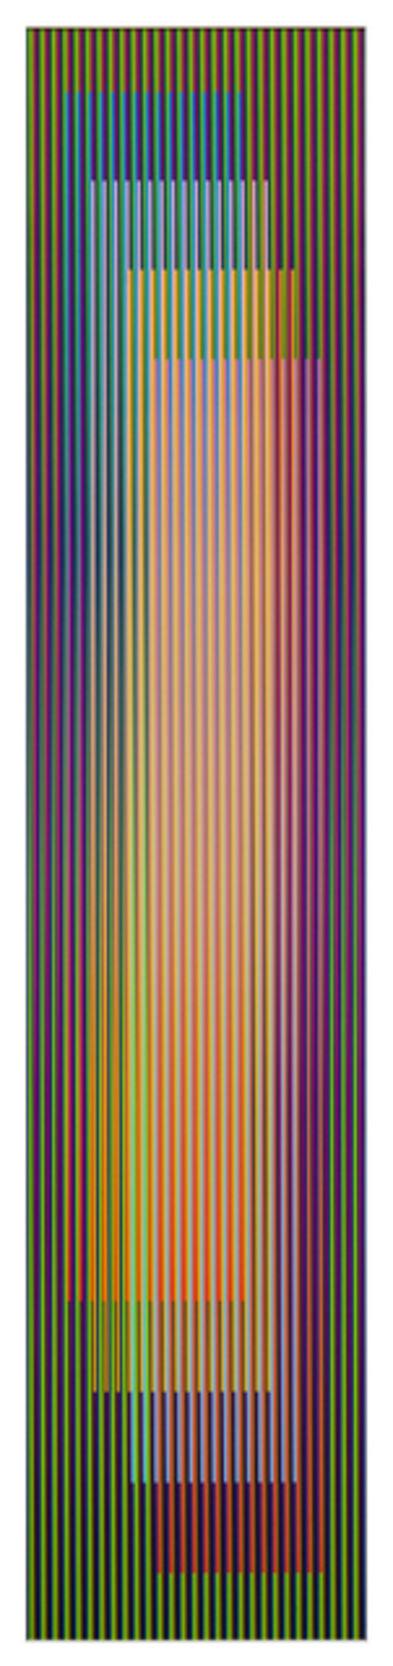 Carlos Cruz-Diez, 'Color aditivo serie larga Panam 3', 2011